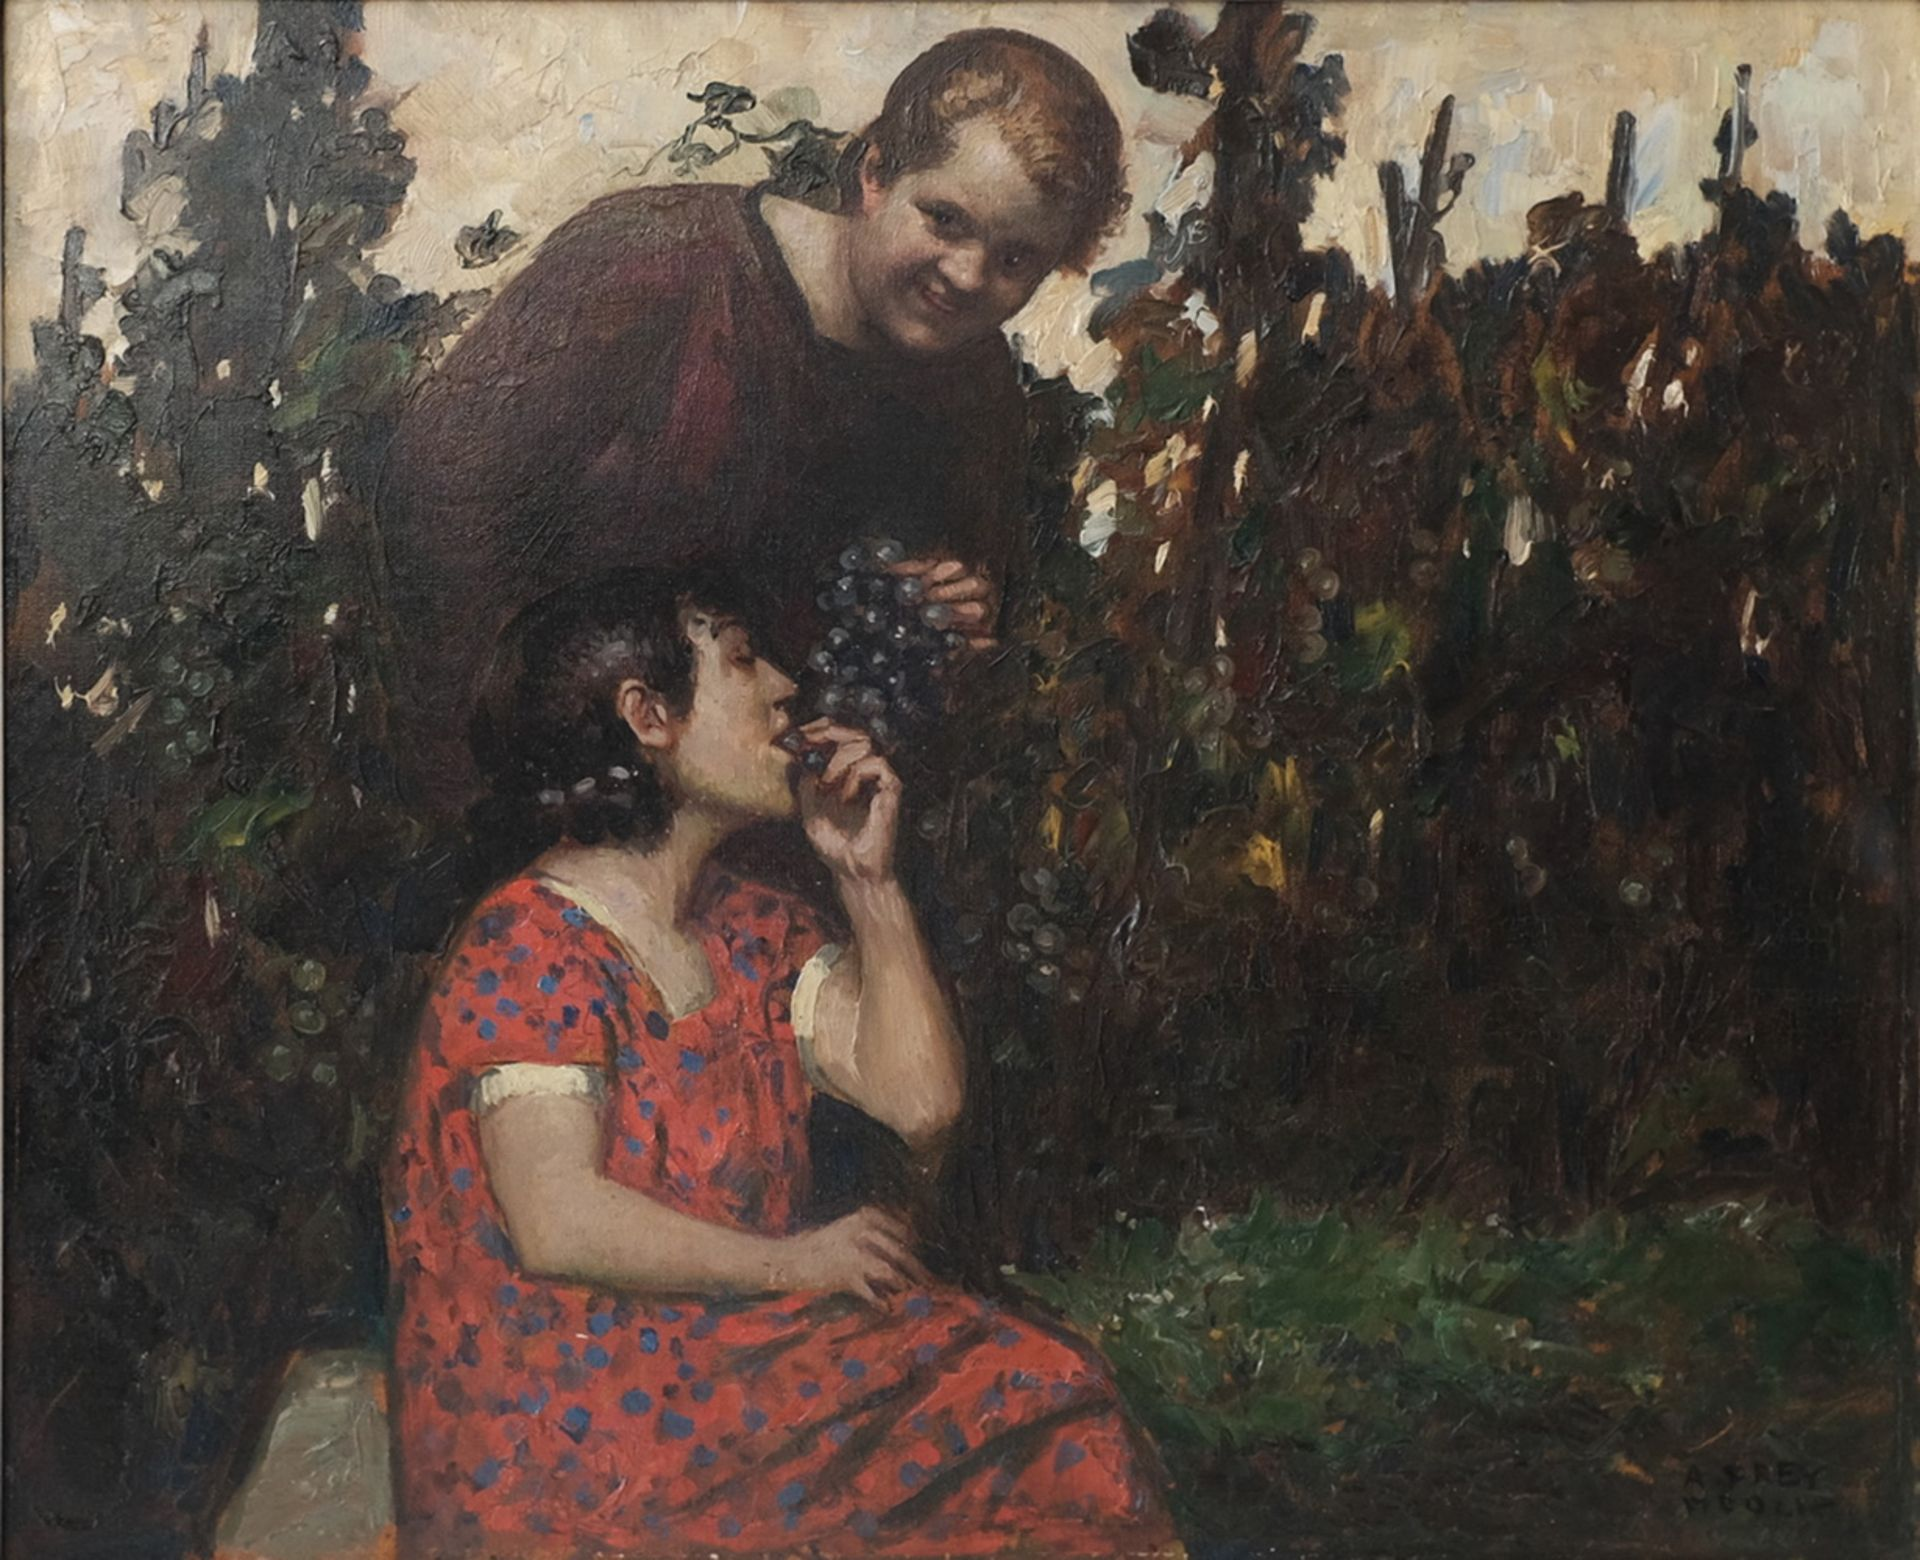 Frey-Moock, Adolf. Grapevine. [The first half of the ХХ century]. Oil on canvas. 50,5x60 cm.<br>Sign